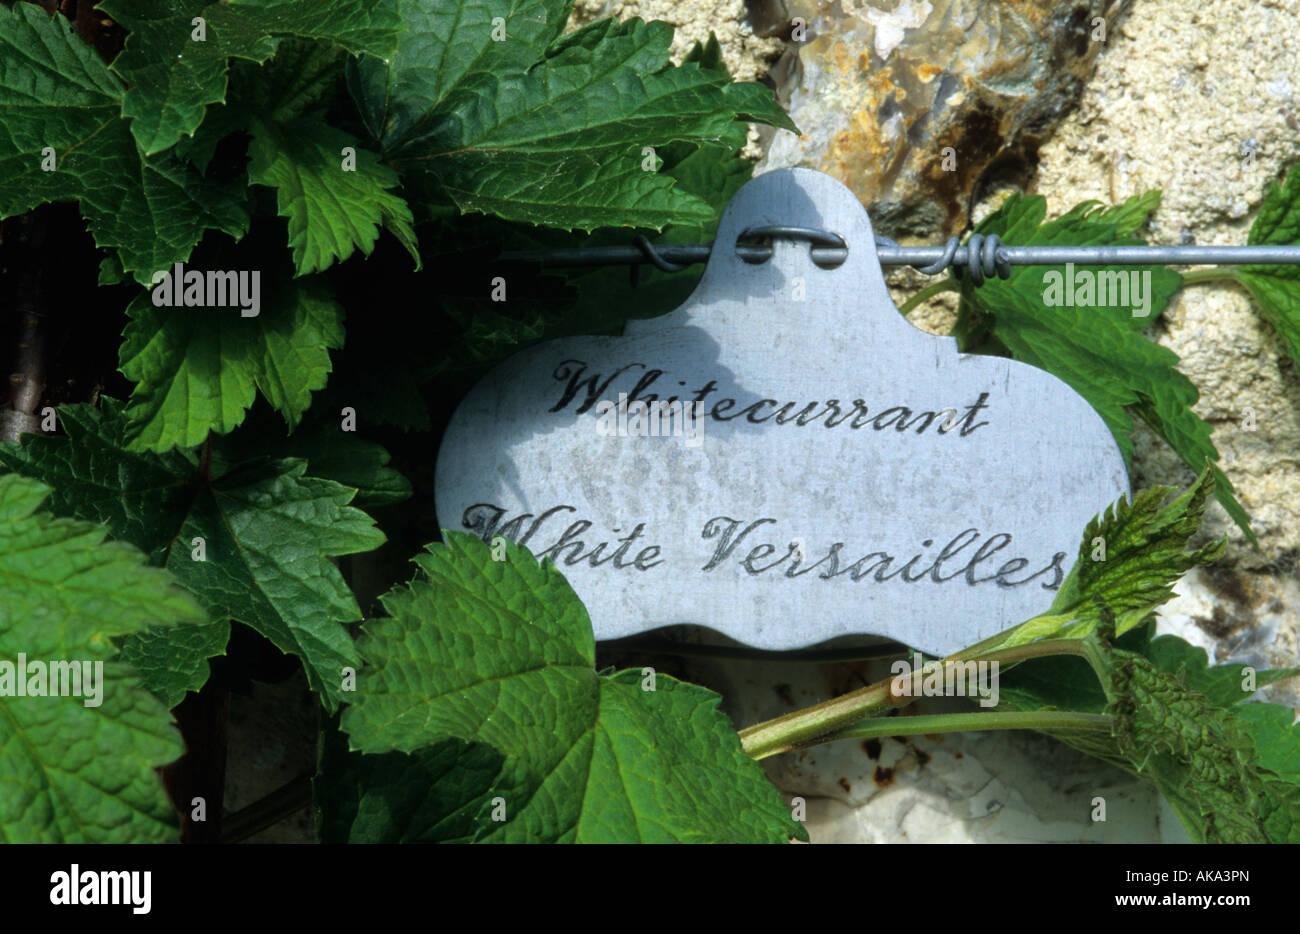 West Dean Sussex hand written plant label - Stock Image